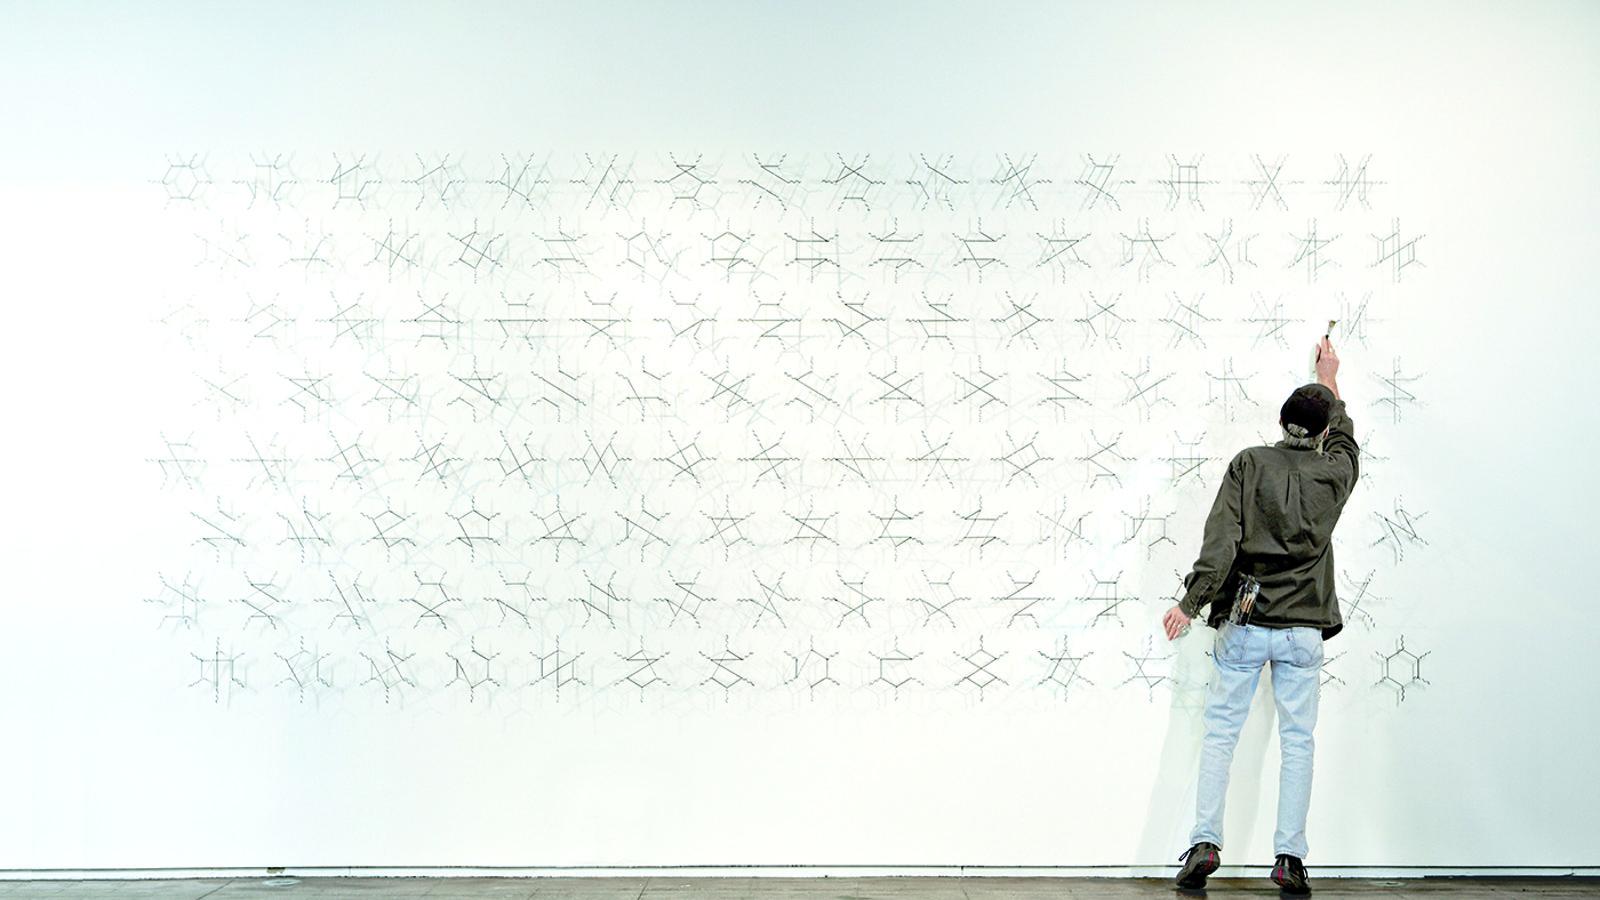 Tufte's Feynman sculptures come to Fermilab | symmetry magazine